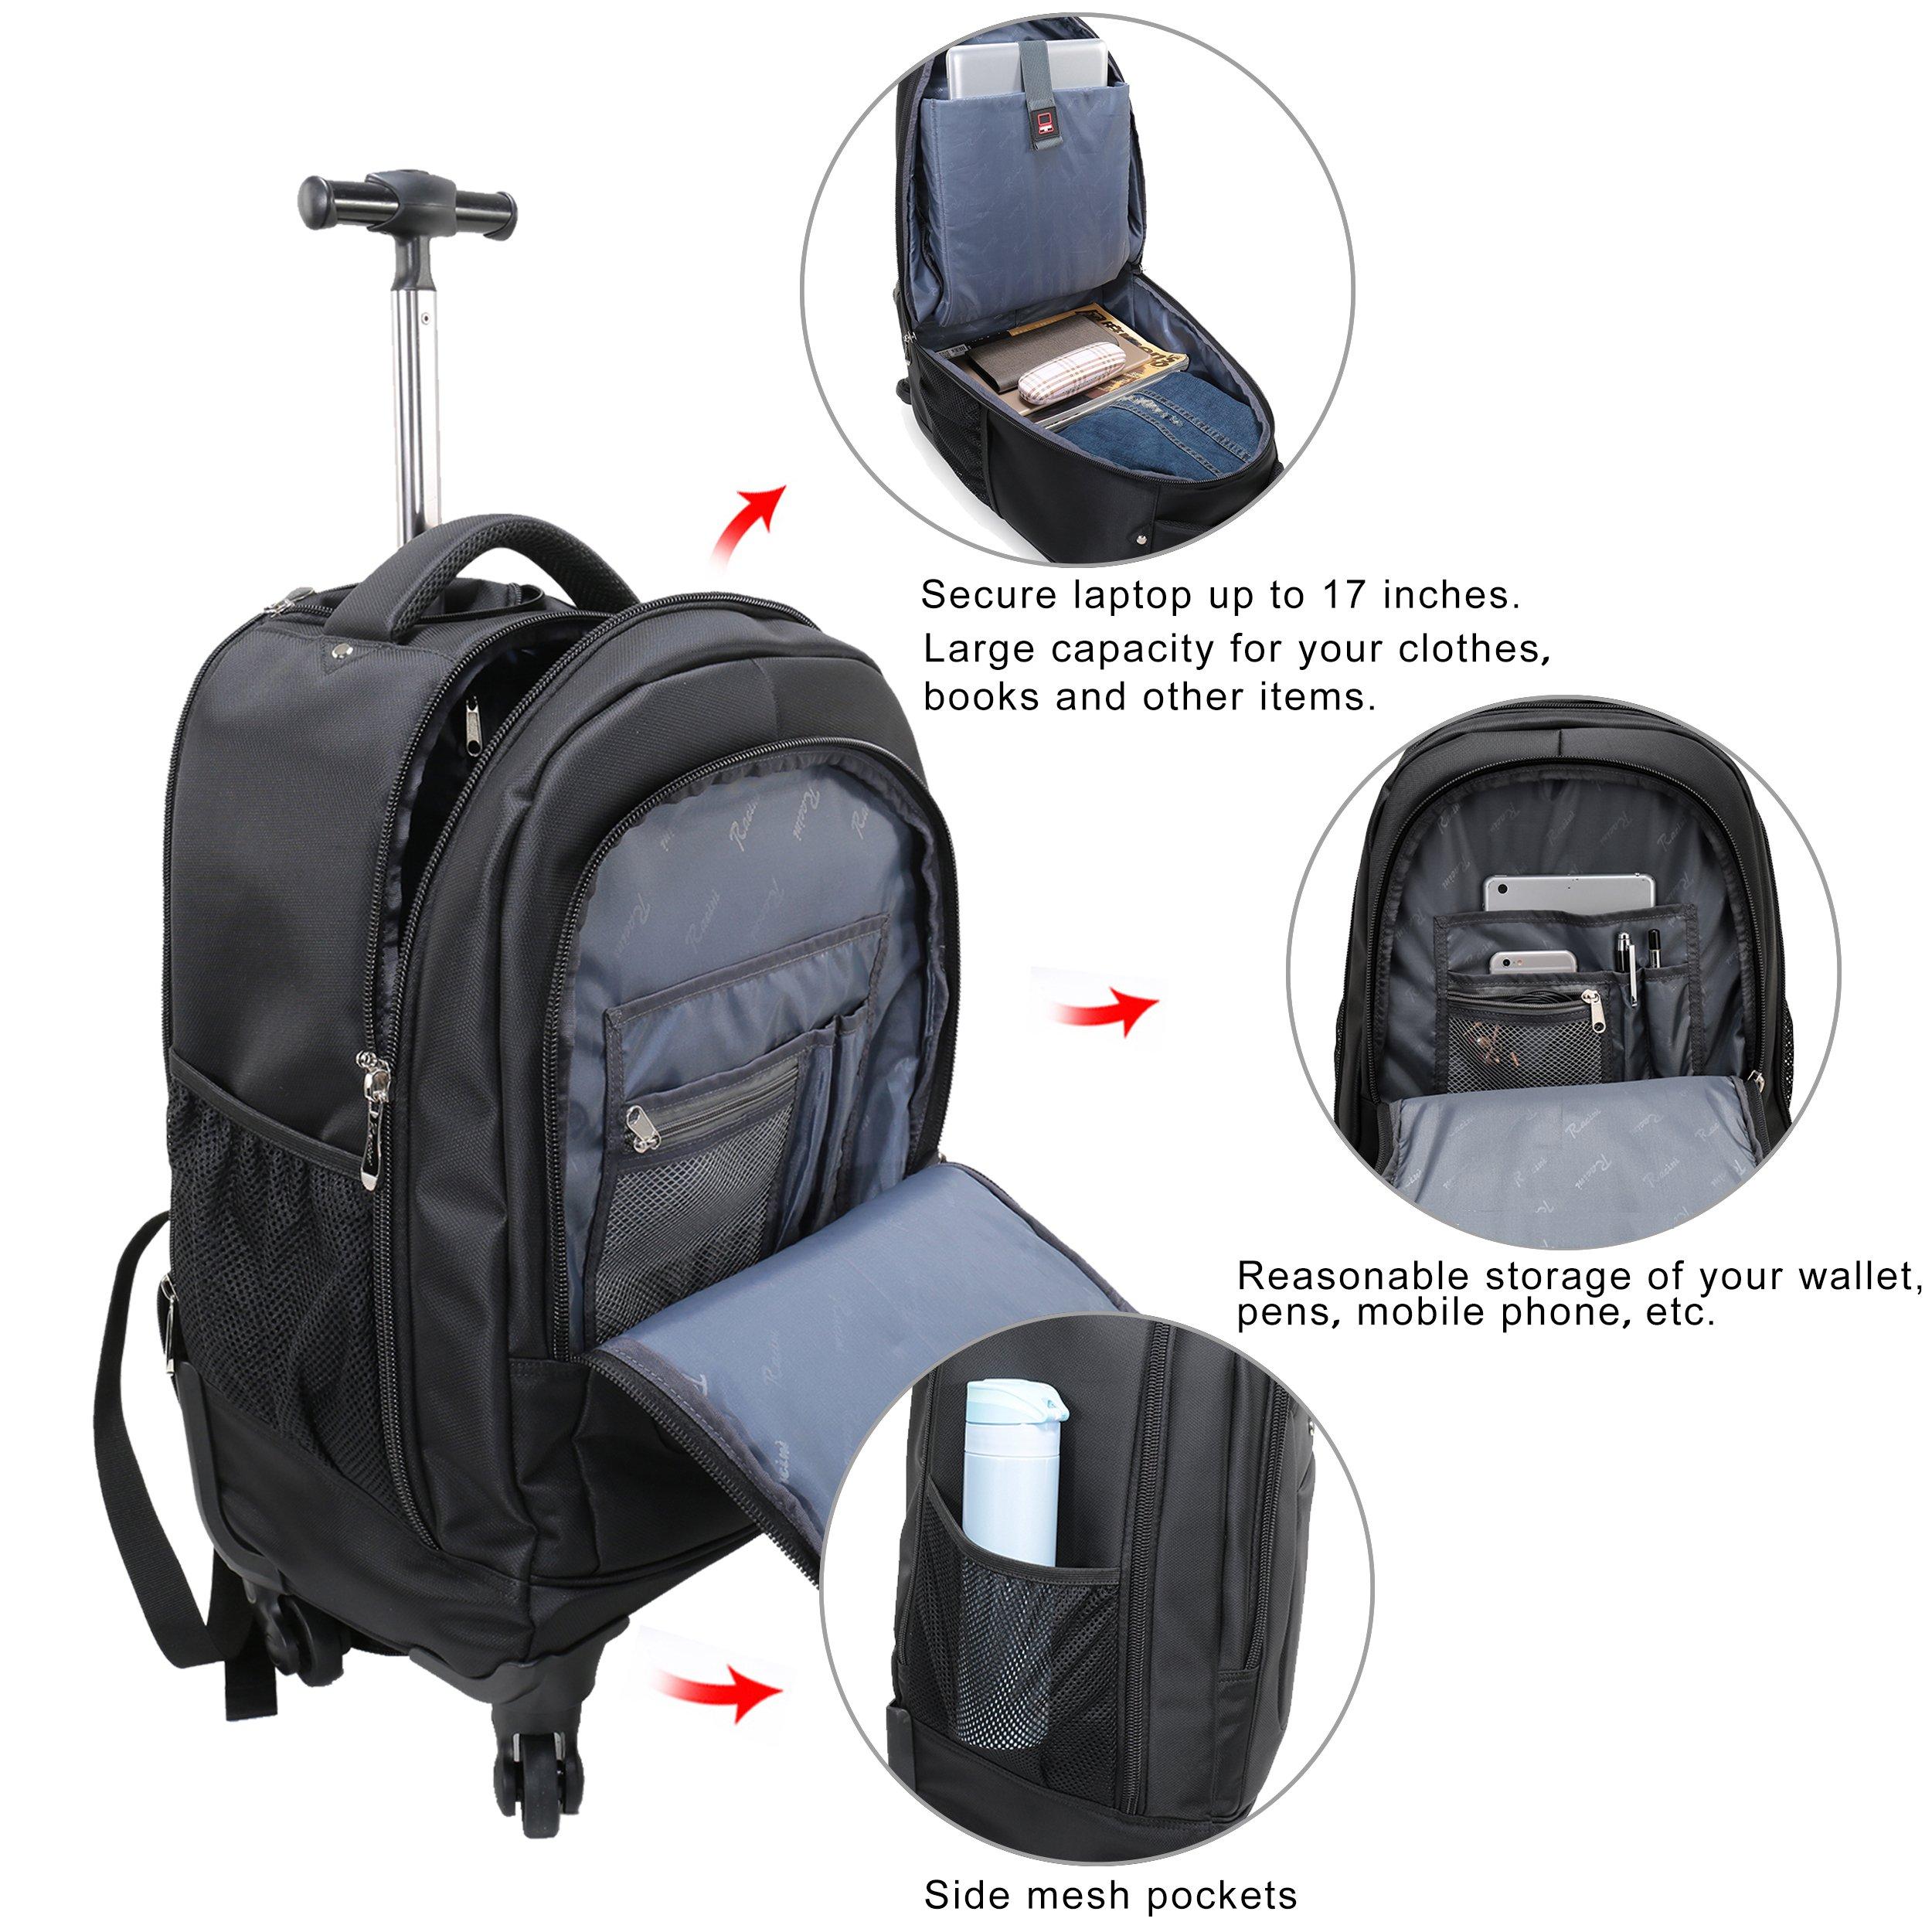 63e4f0bbf Racini Nylon Waterproof Rolling Backpack, Freewheel Travel School Wheeled  Backpack, Carry-on Luggage with Anti-theft Zippers (Black)